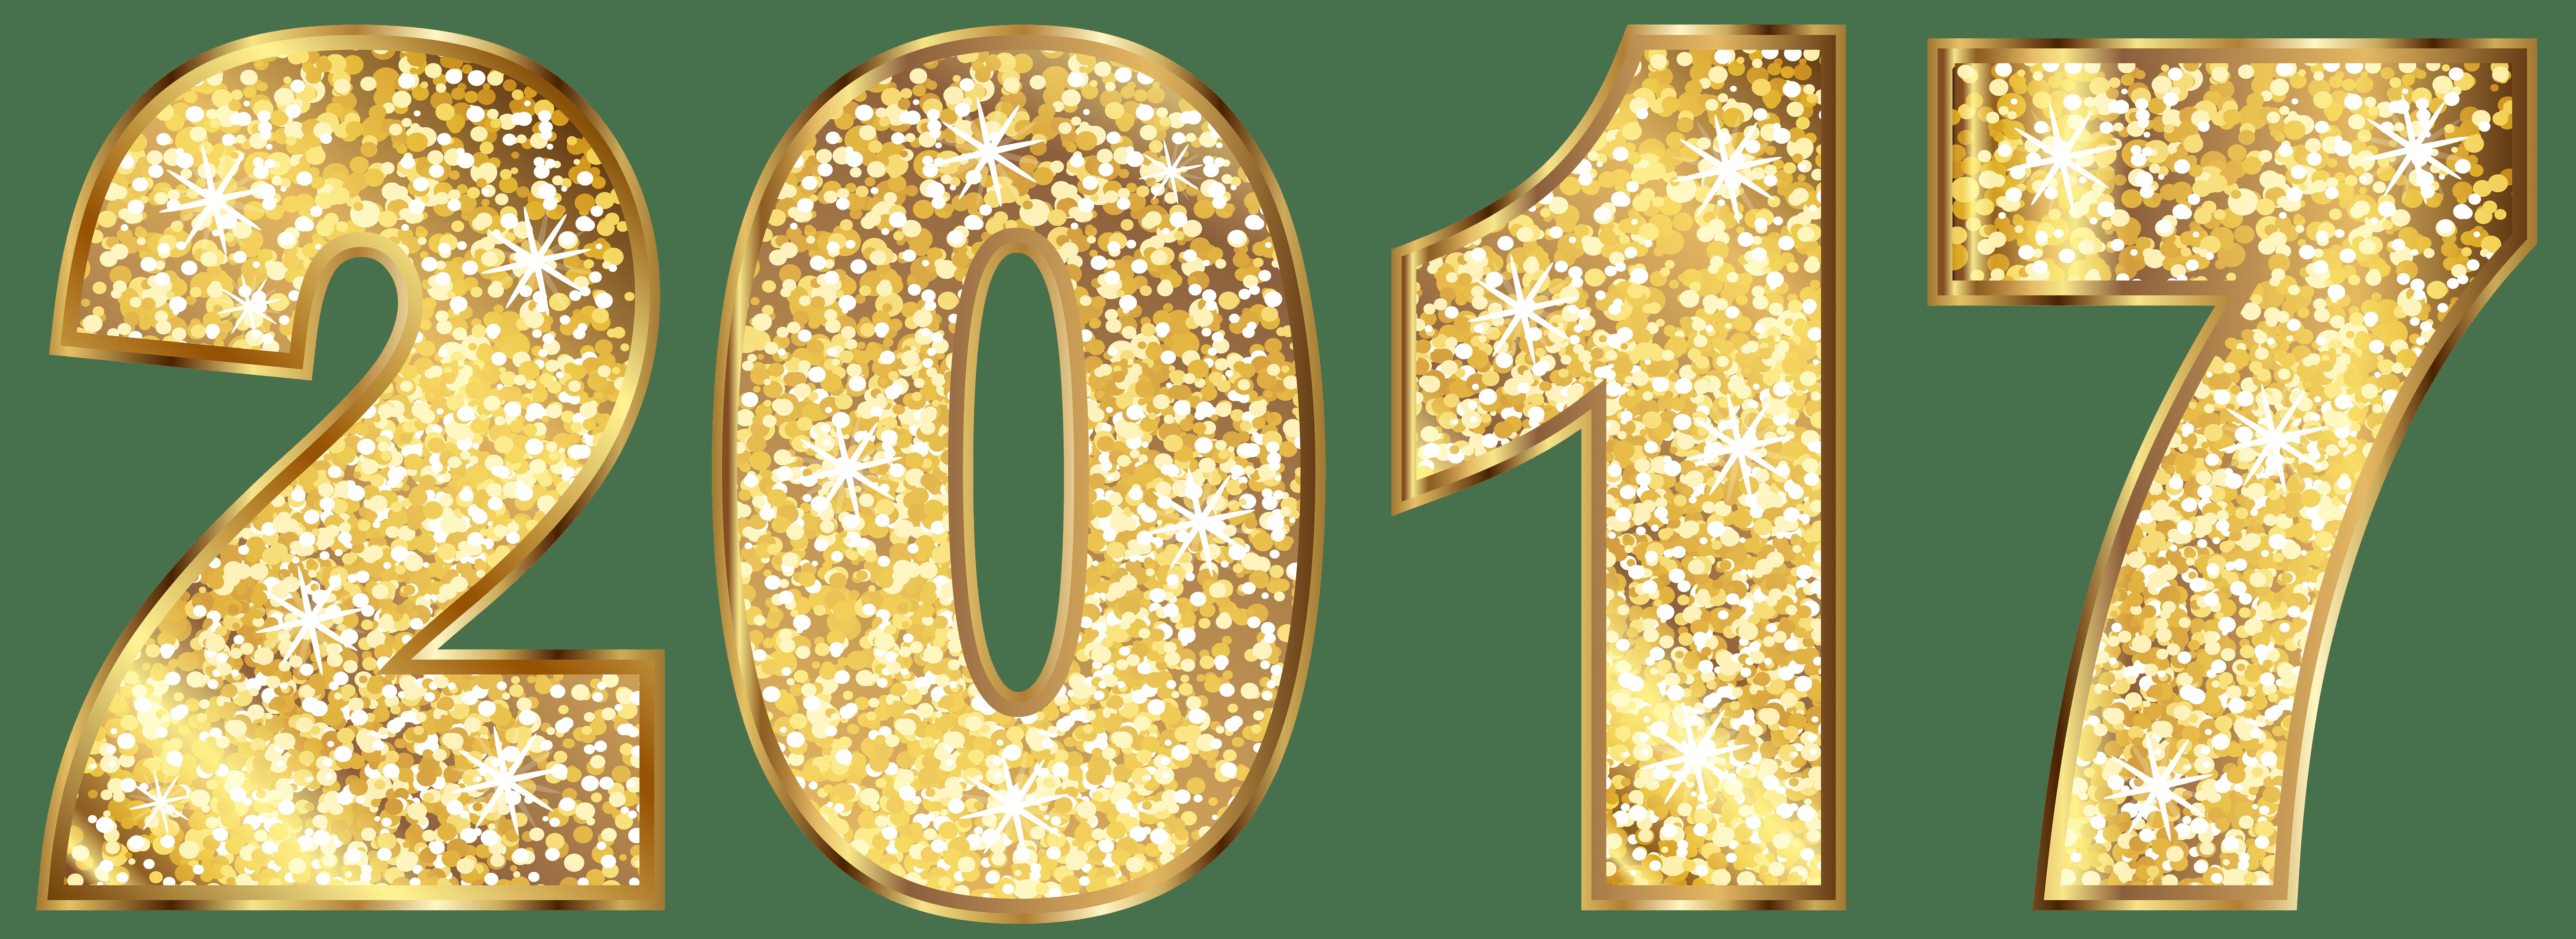 2017 Gold transparent PNG.